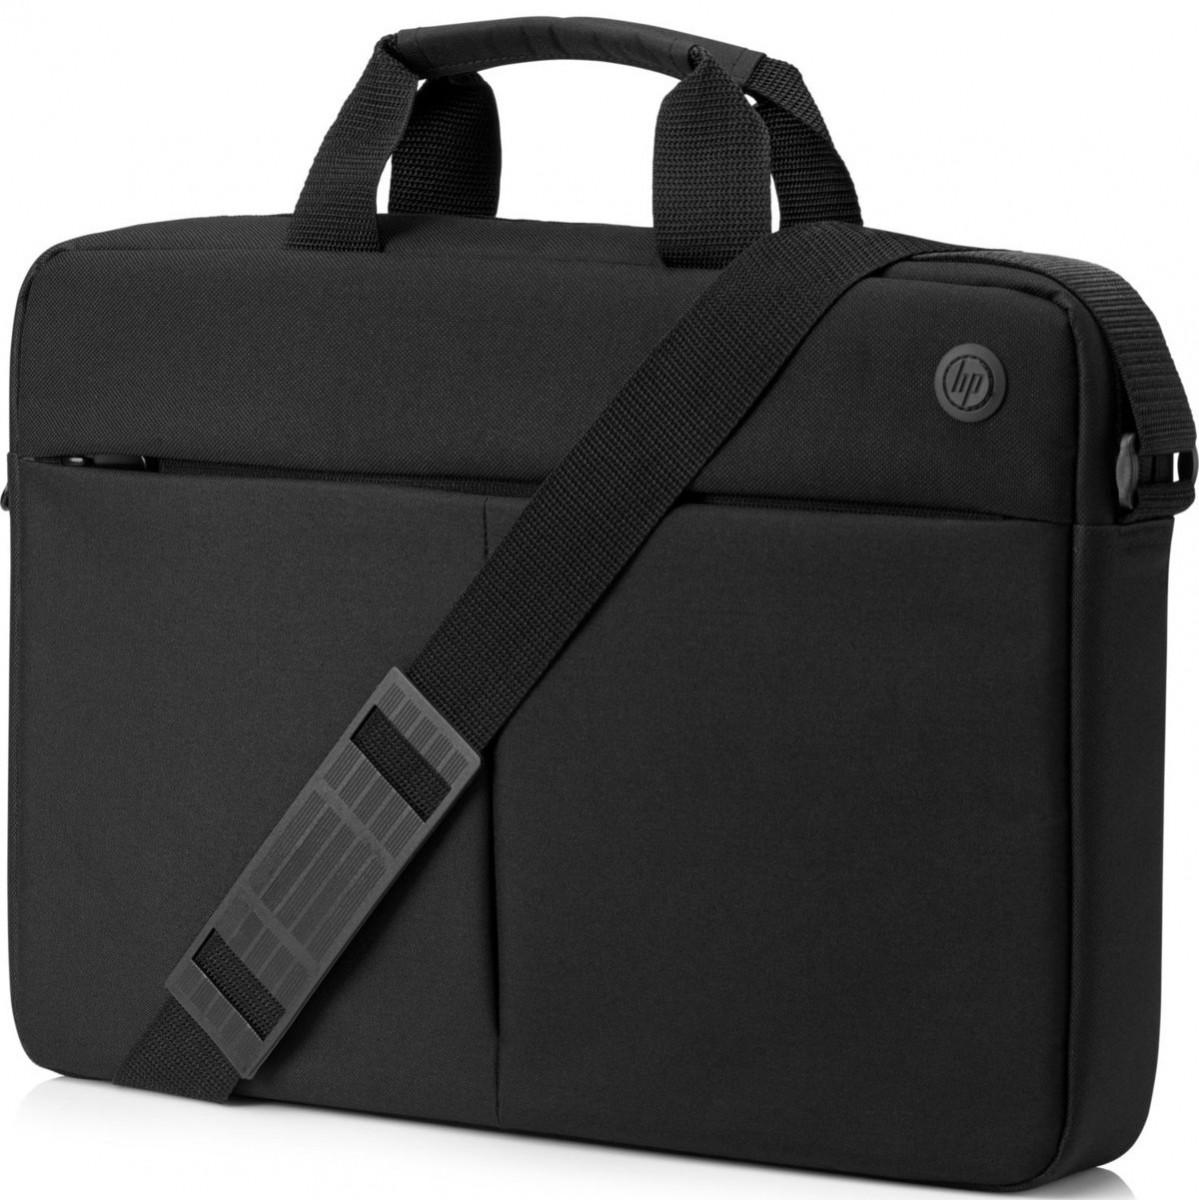 "HP 2MW62AA Сумка для ноутбука 15,6"" Prelude Top Load with Mouse Bundle (мышь в комплекте)"